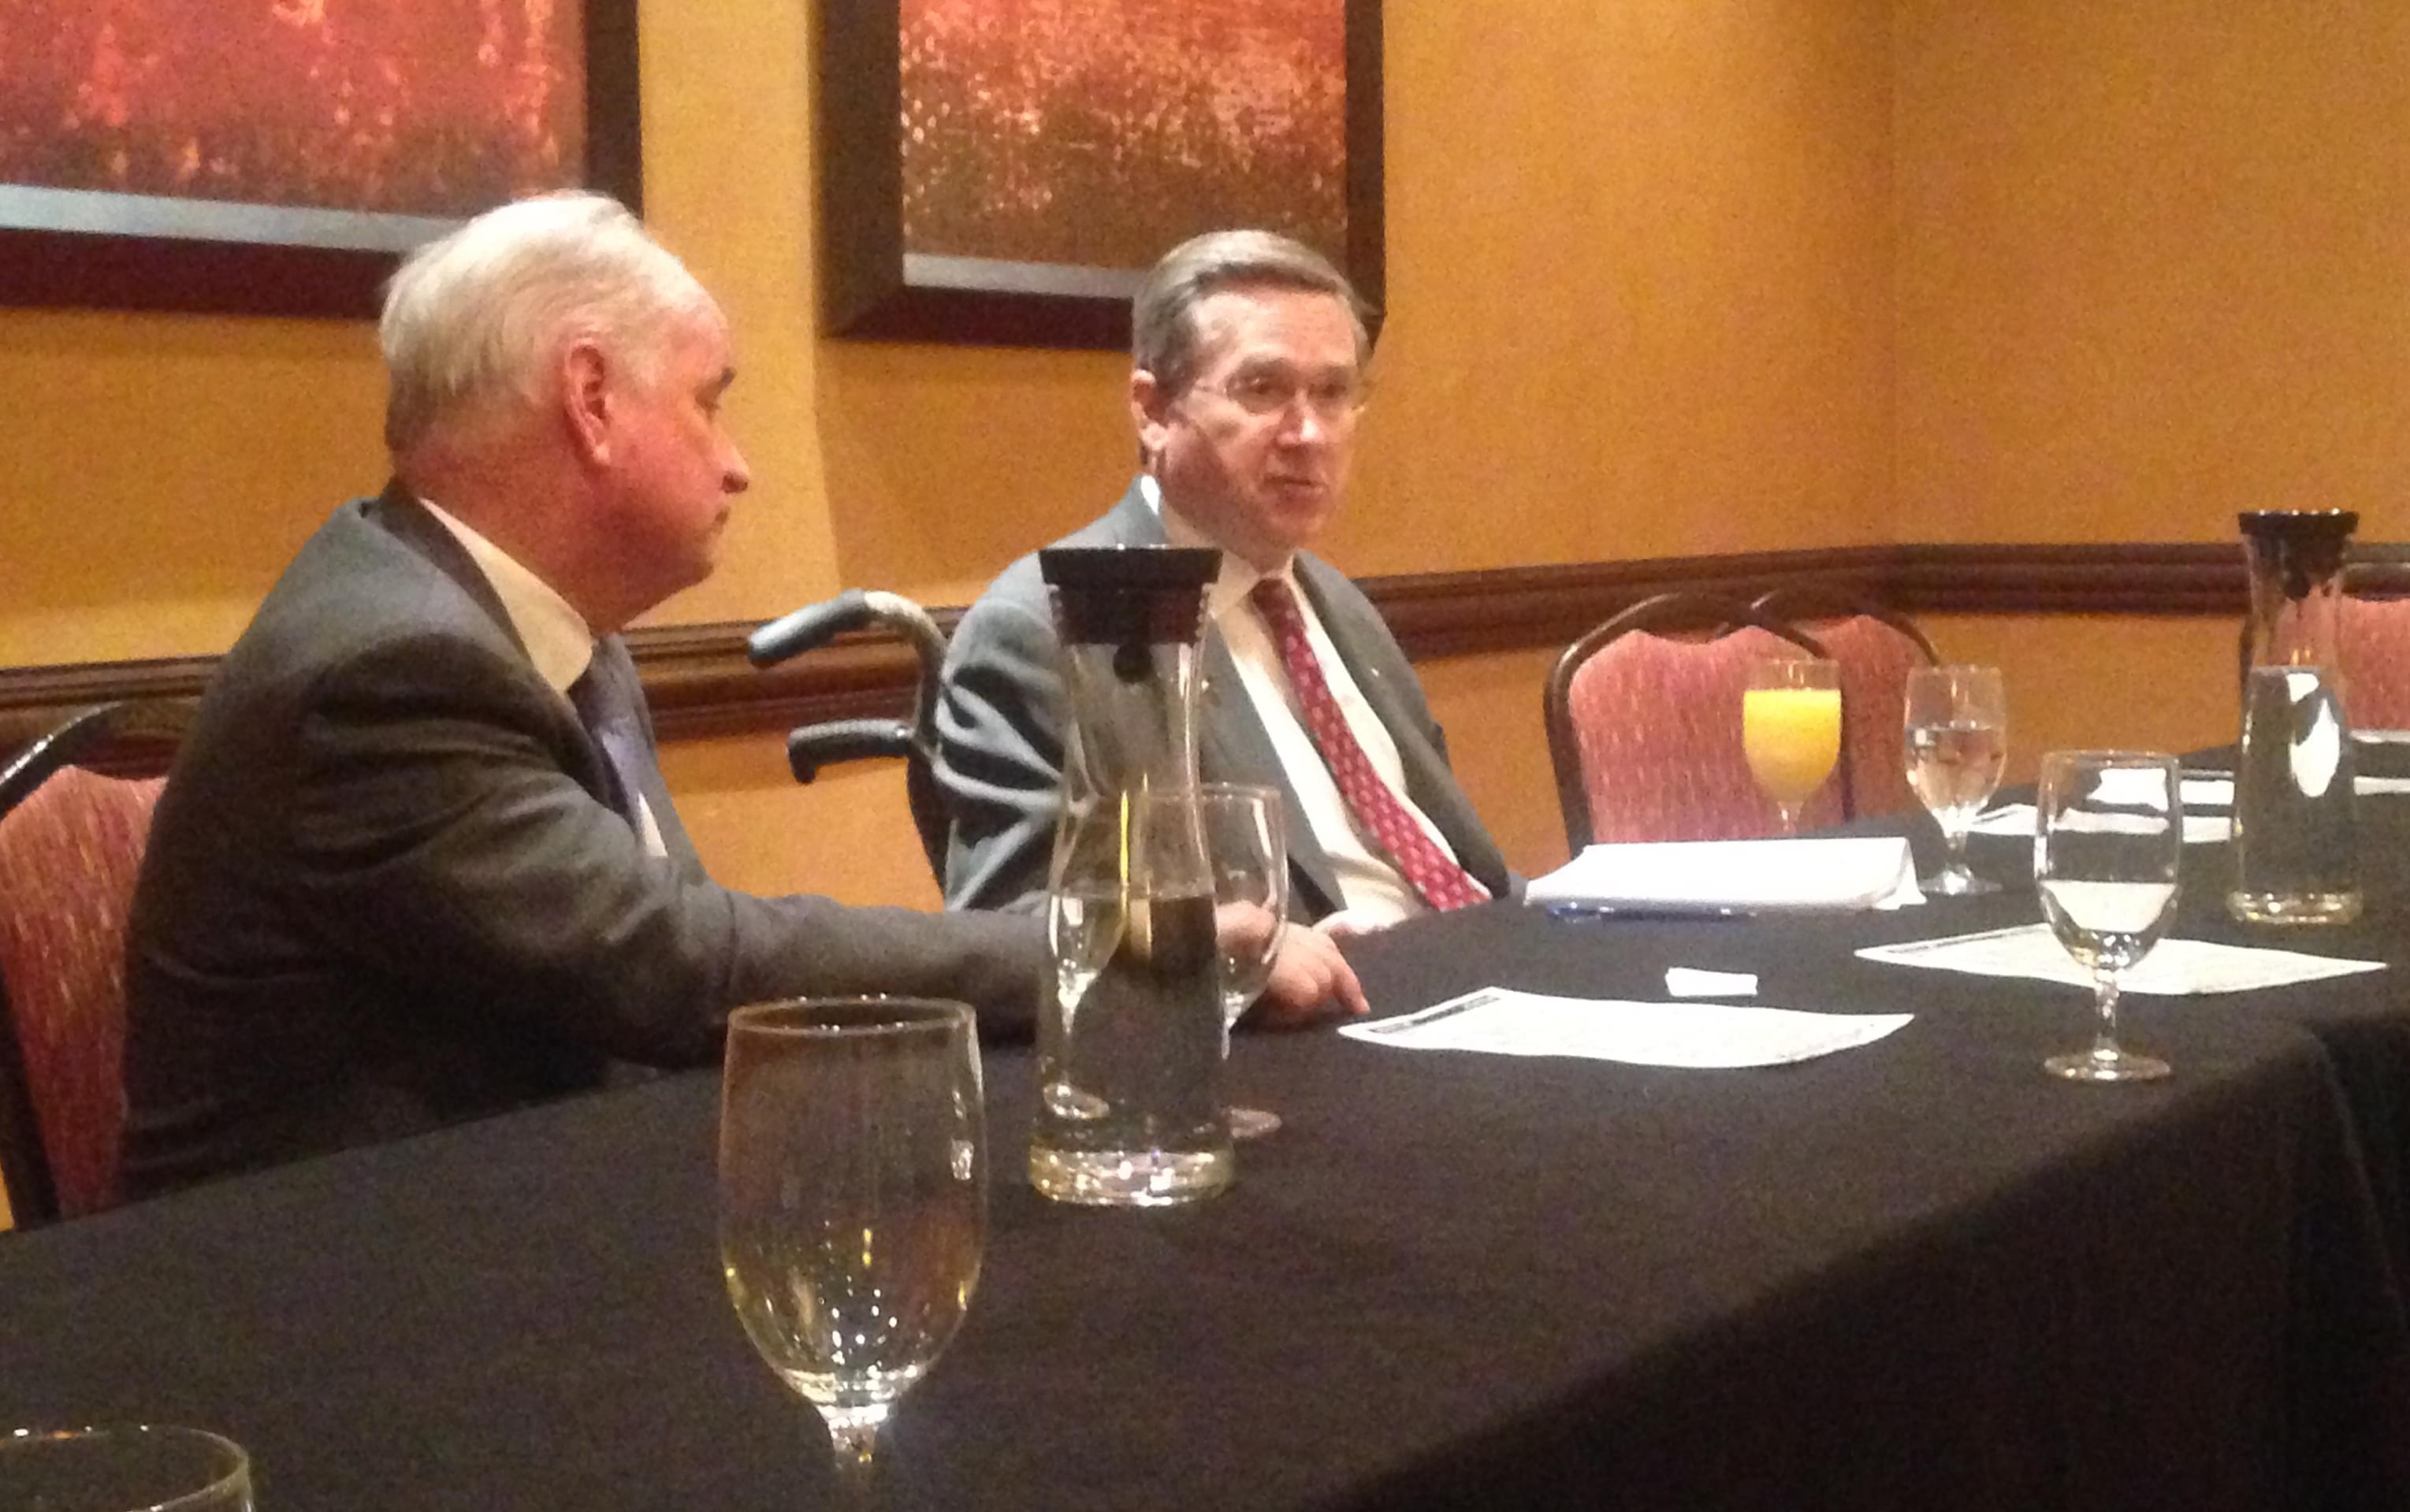 Republican State Representative Dan Brady (L) and GOP U.S. Senator Mark Kirk (R) at the Marriott Hotel in Normal.